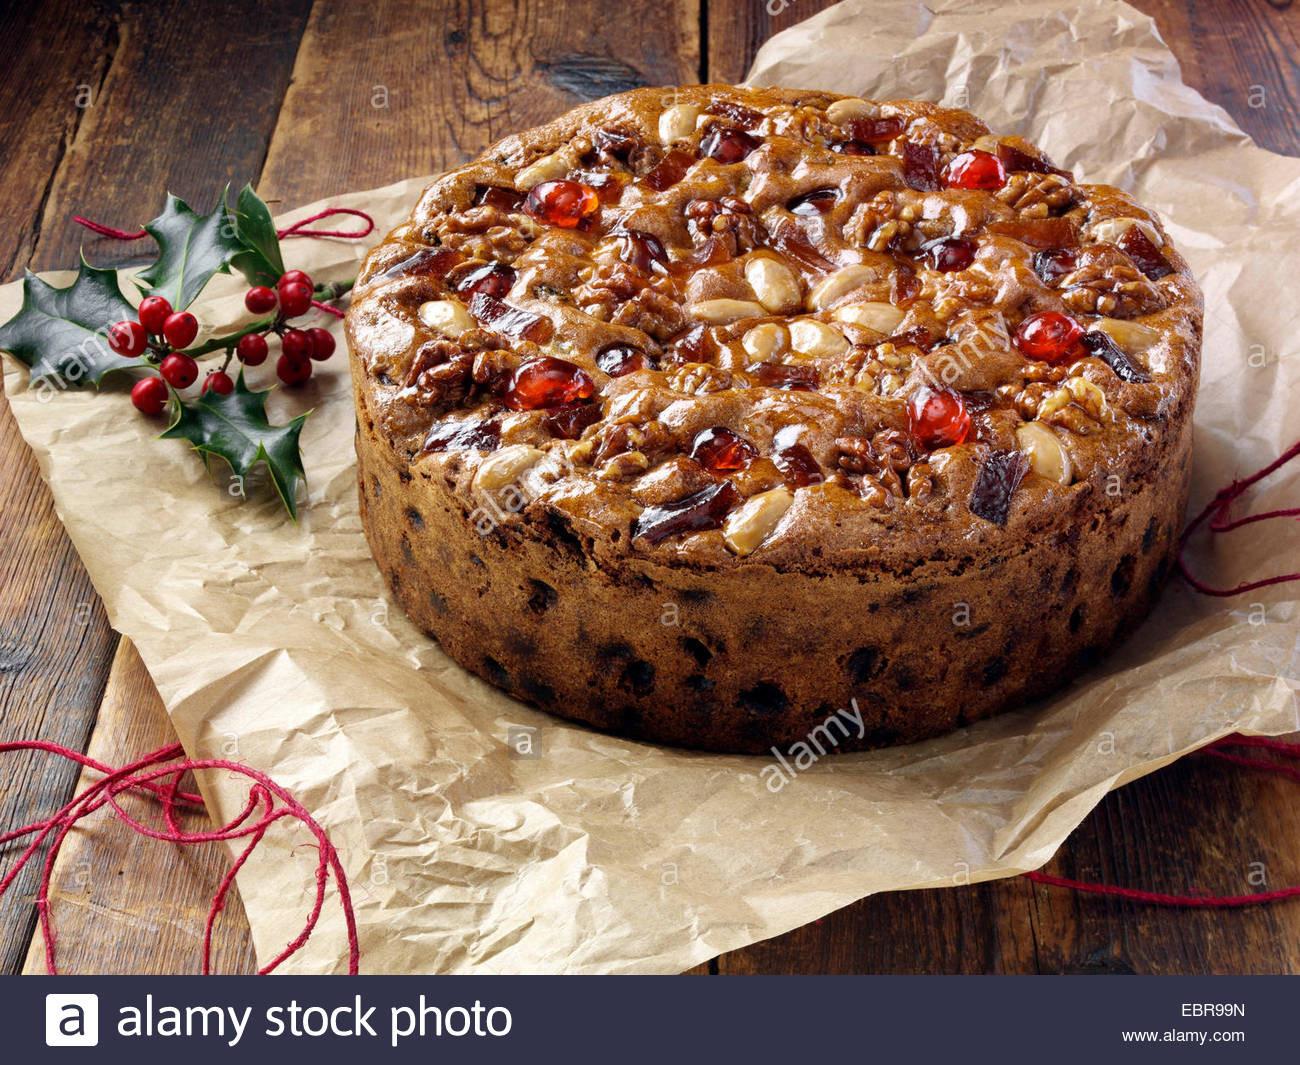 Christmas Desserts Mary Berry  Mary Berry Genoa fruit cake for Christmas Stock